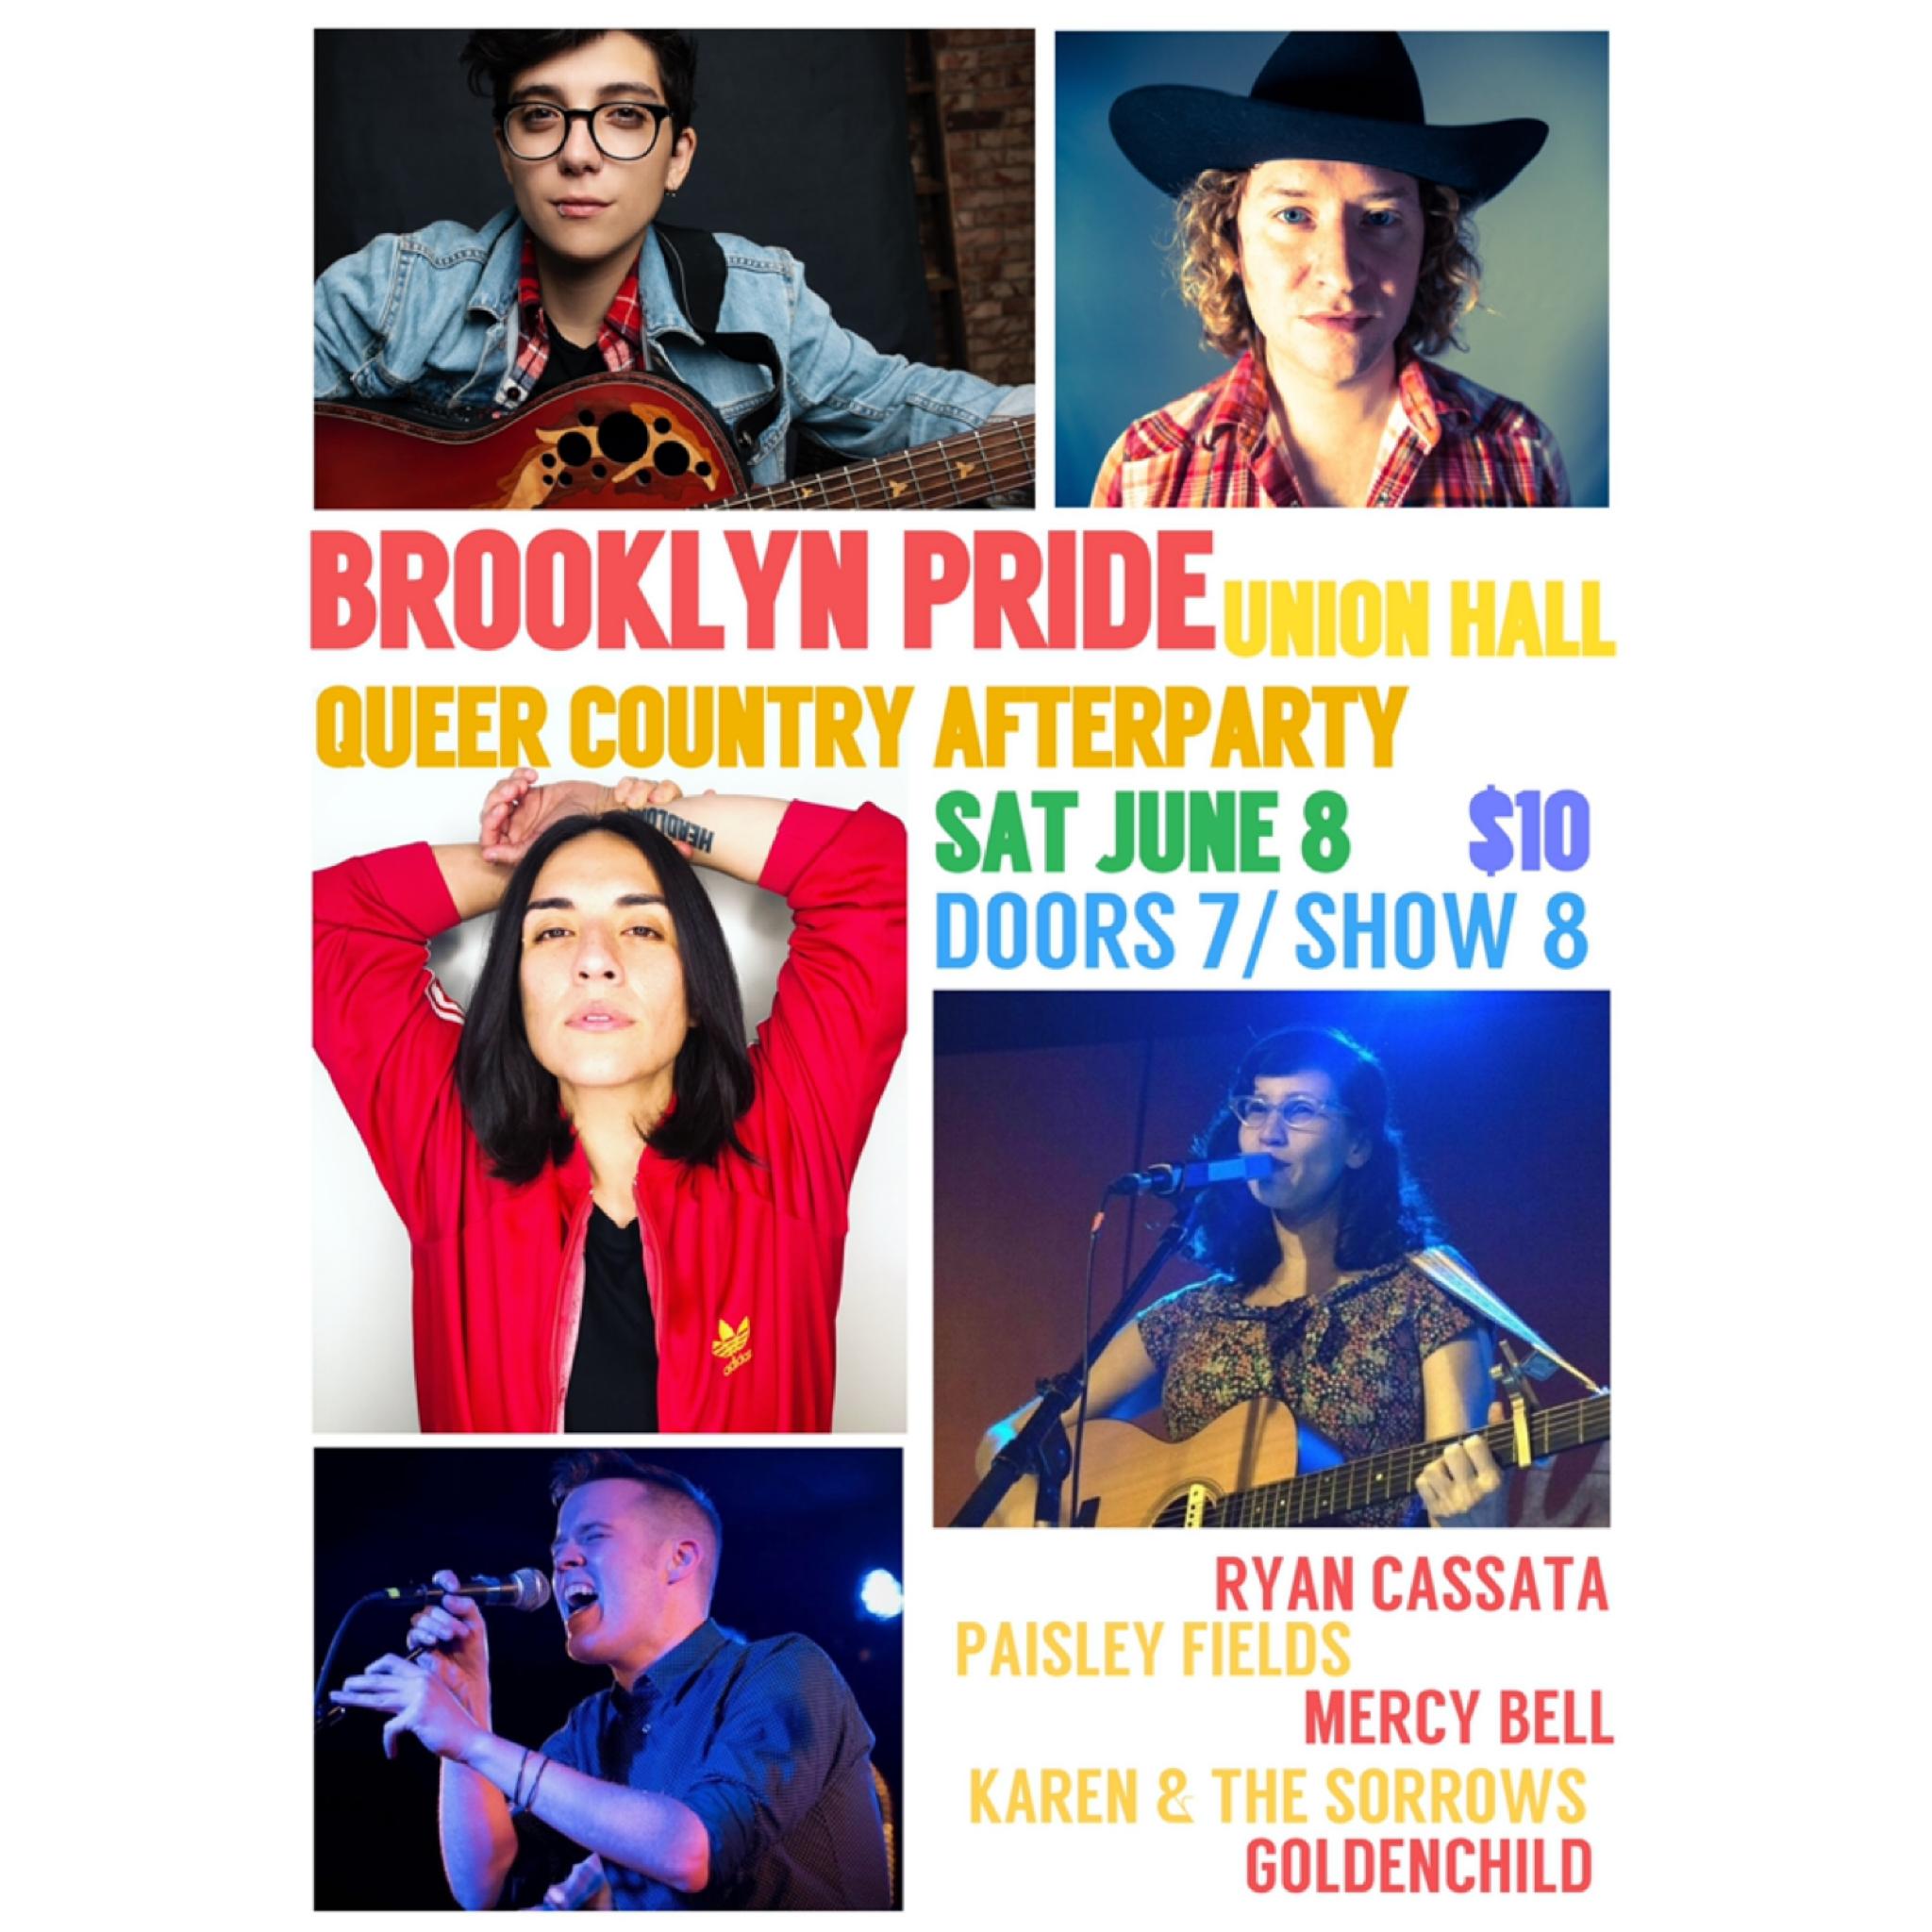 brooklyn pride queer country